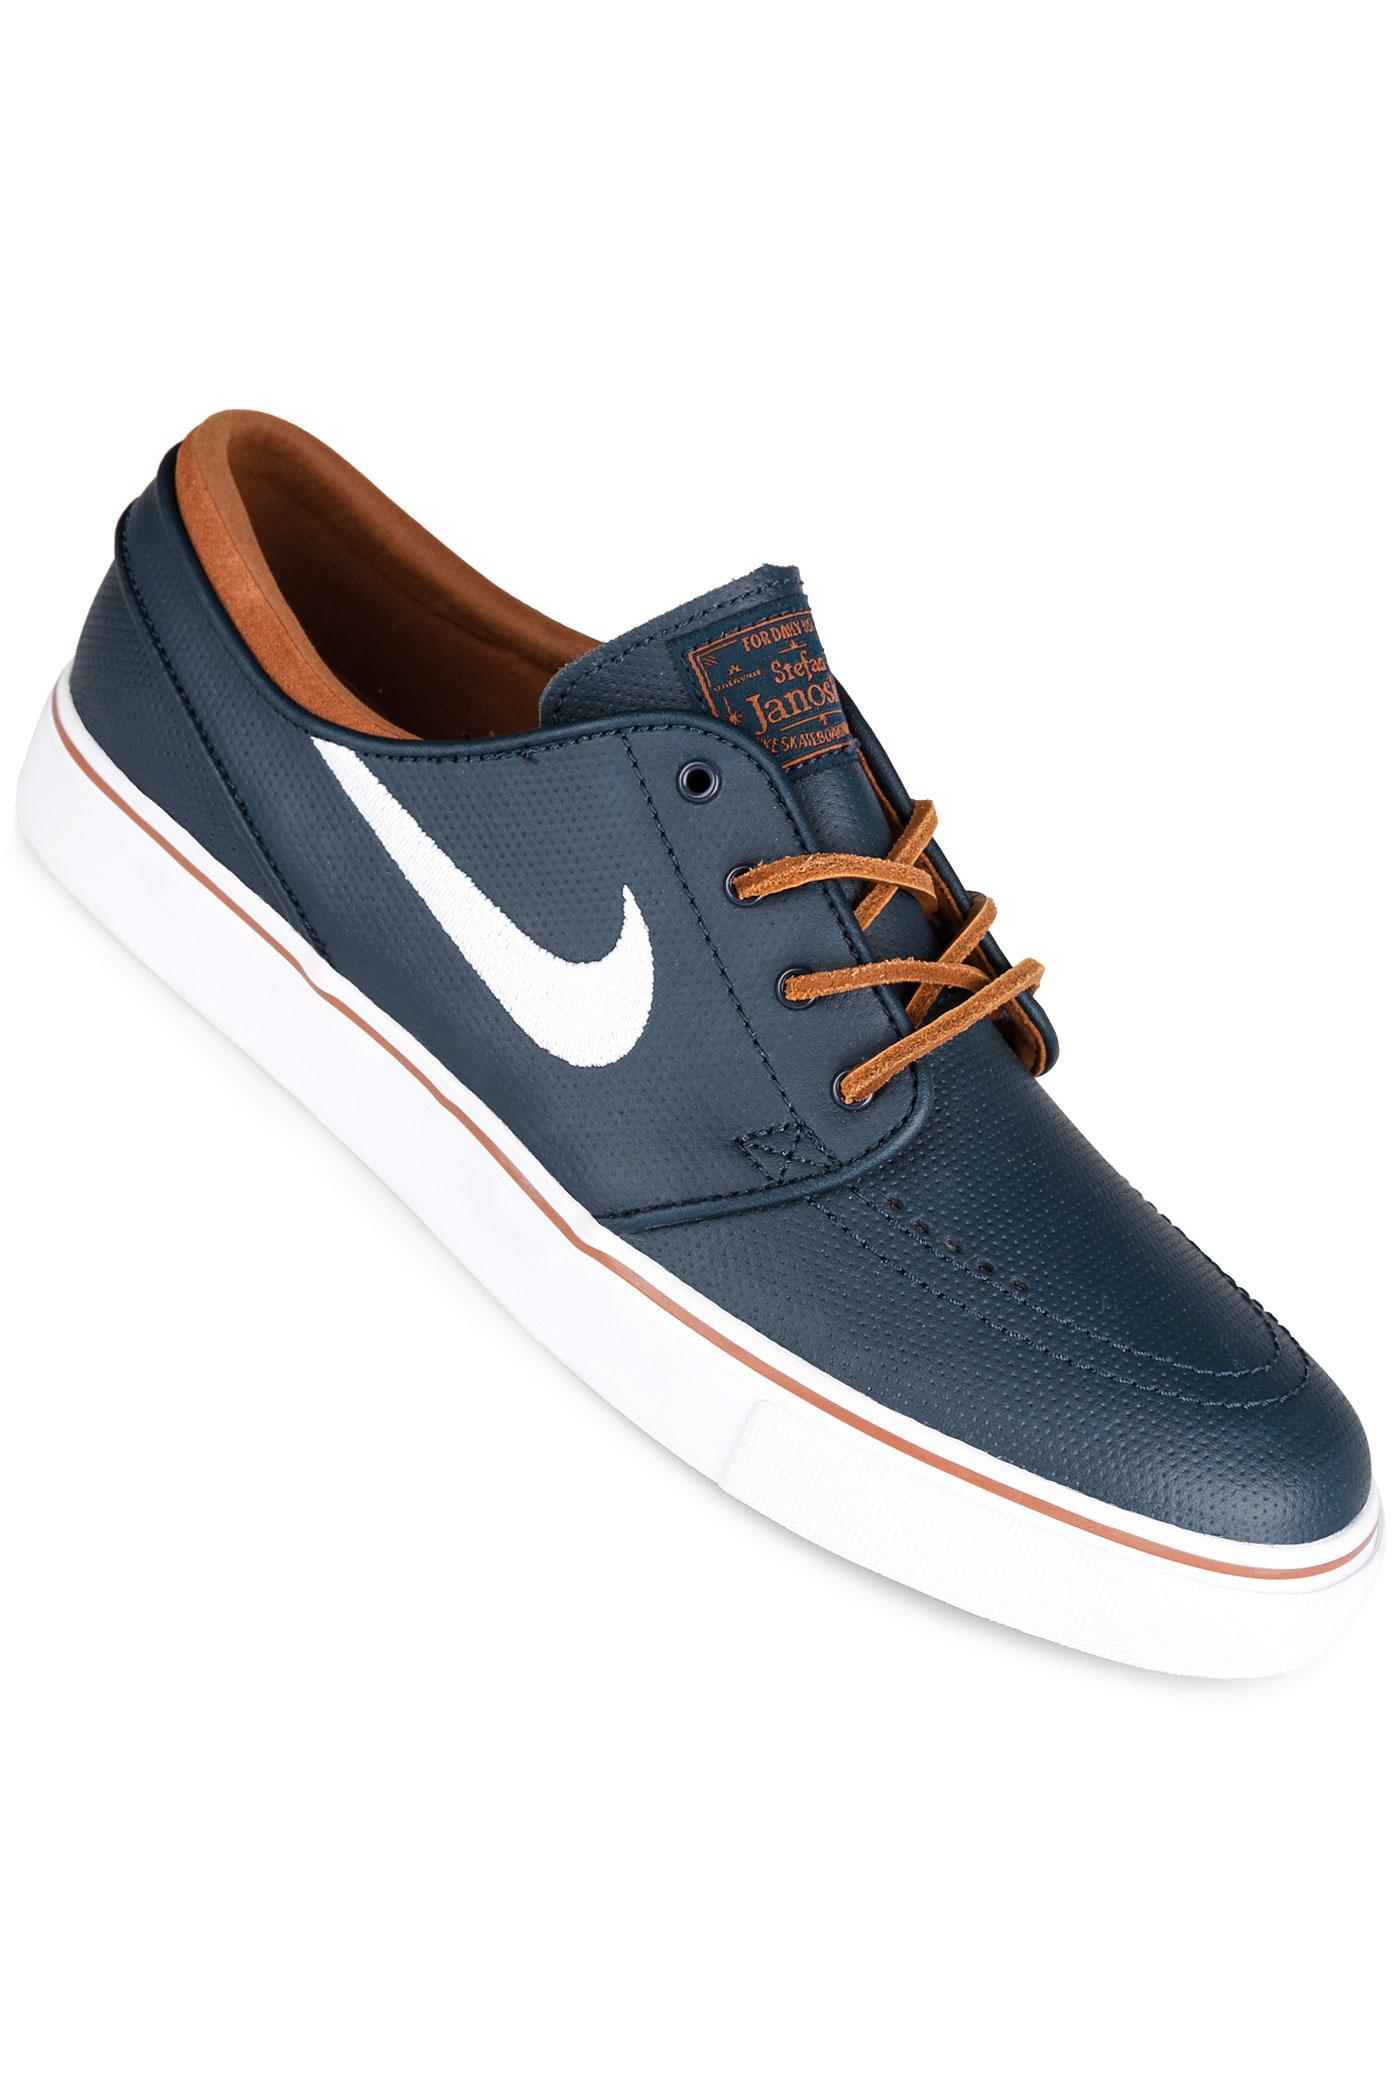 4e9925737f2d Nike SB Zoom Stefan Janoski OG Shoe (obsidian white rustic) buy at ...